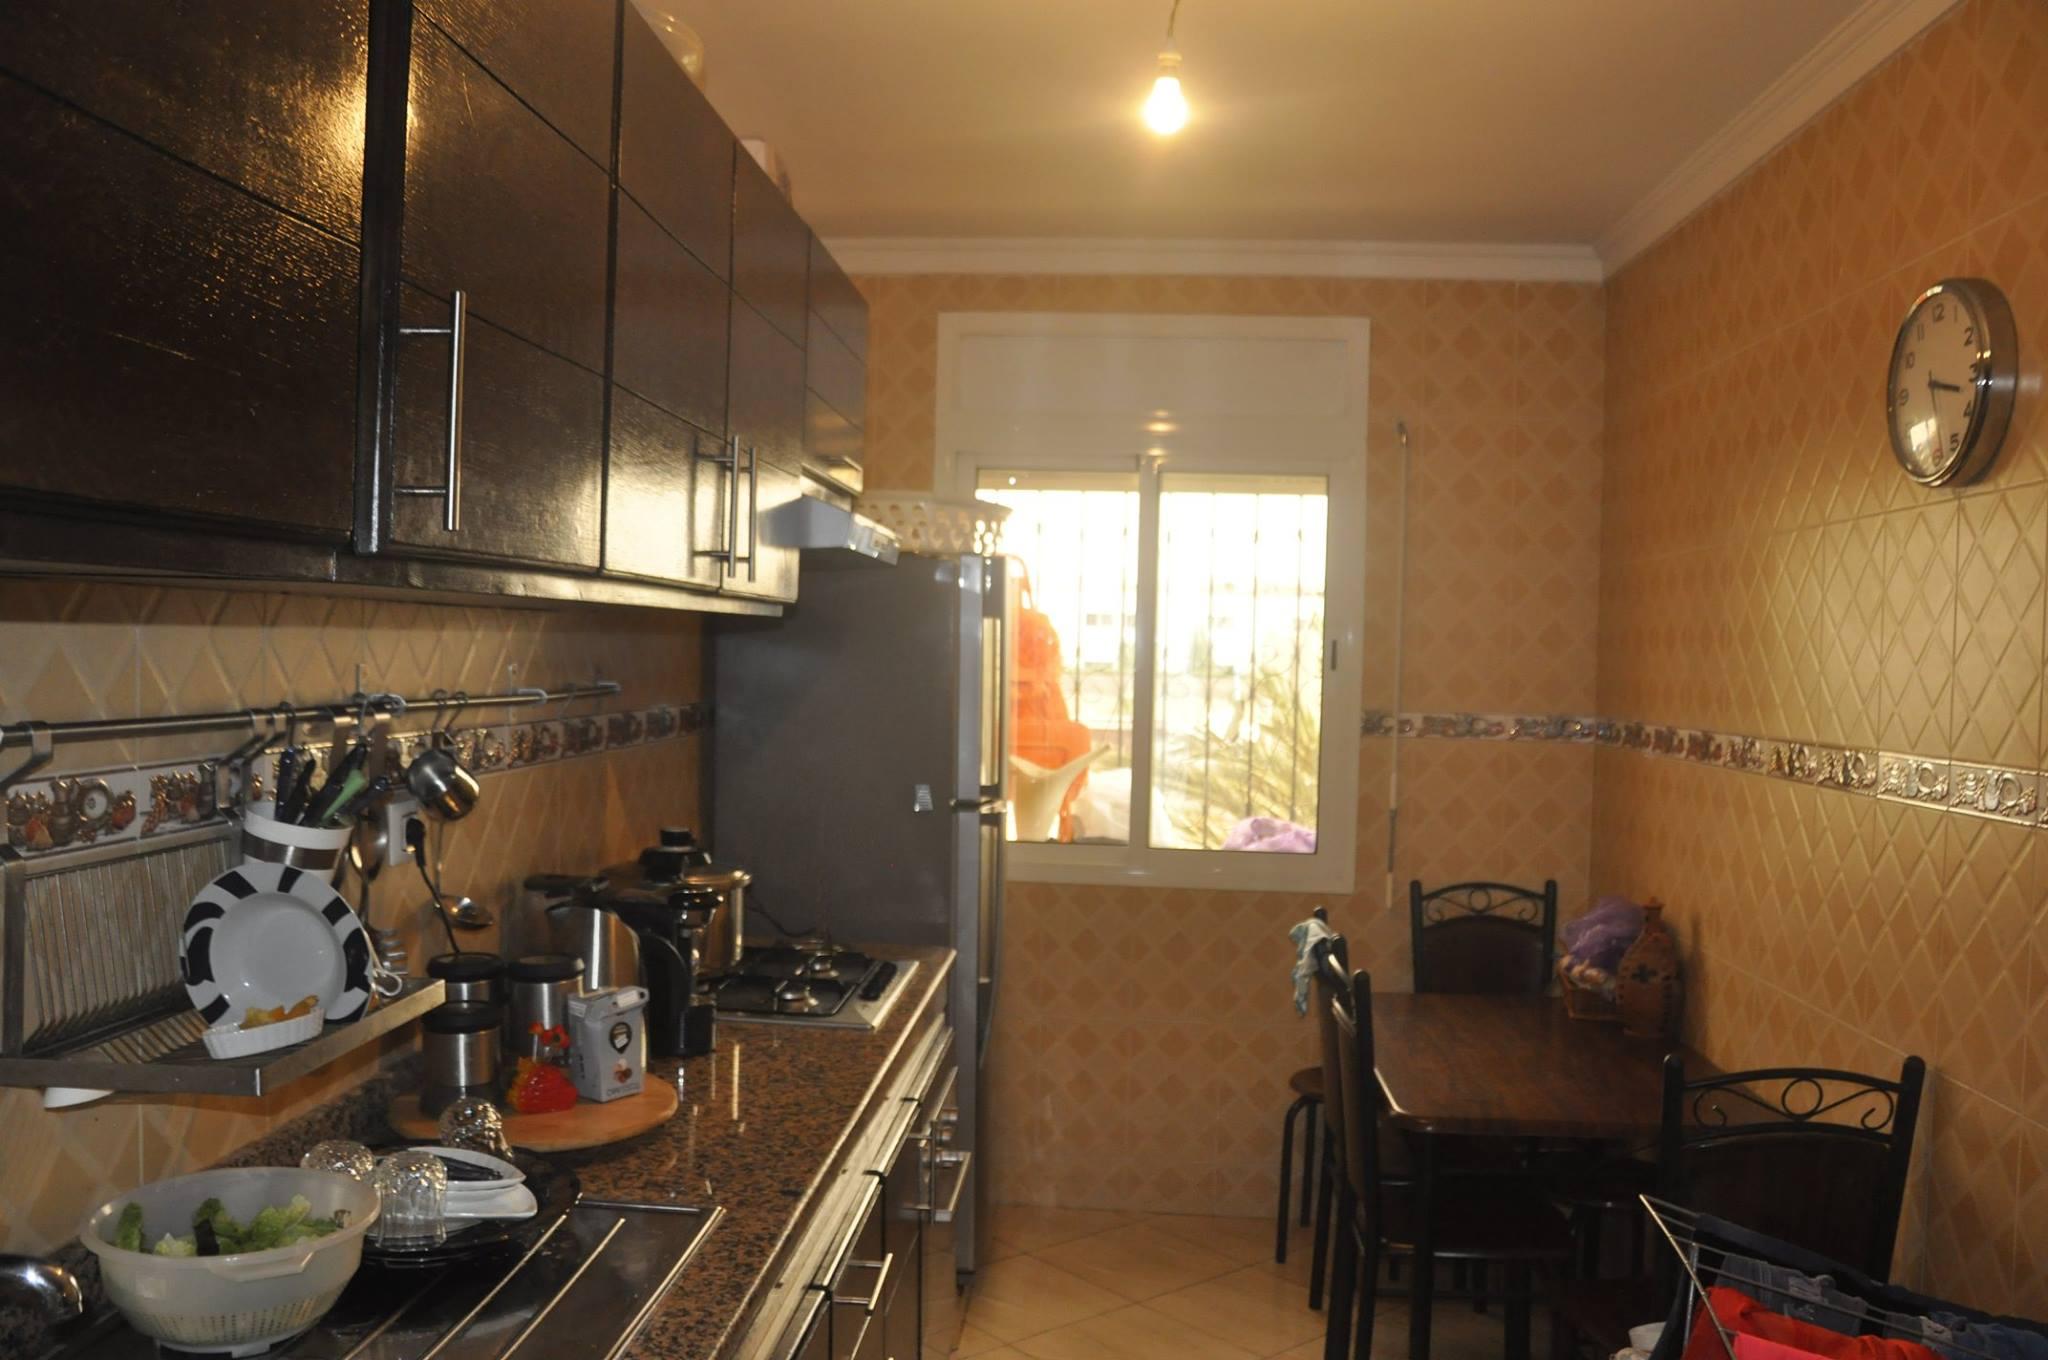 appartement a vendre achat grand casablanca. Black Bedroom Furniture Sets. Home Design Ideas